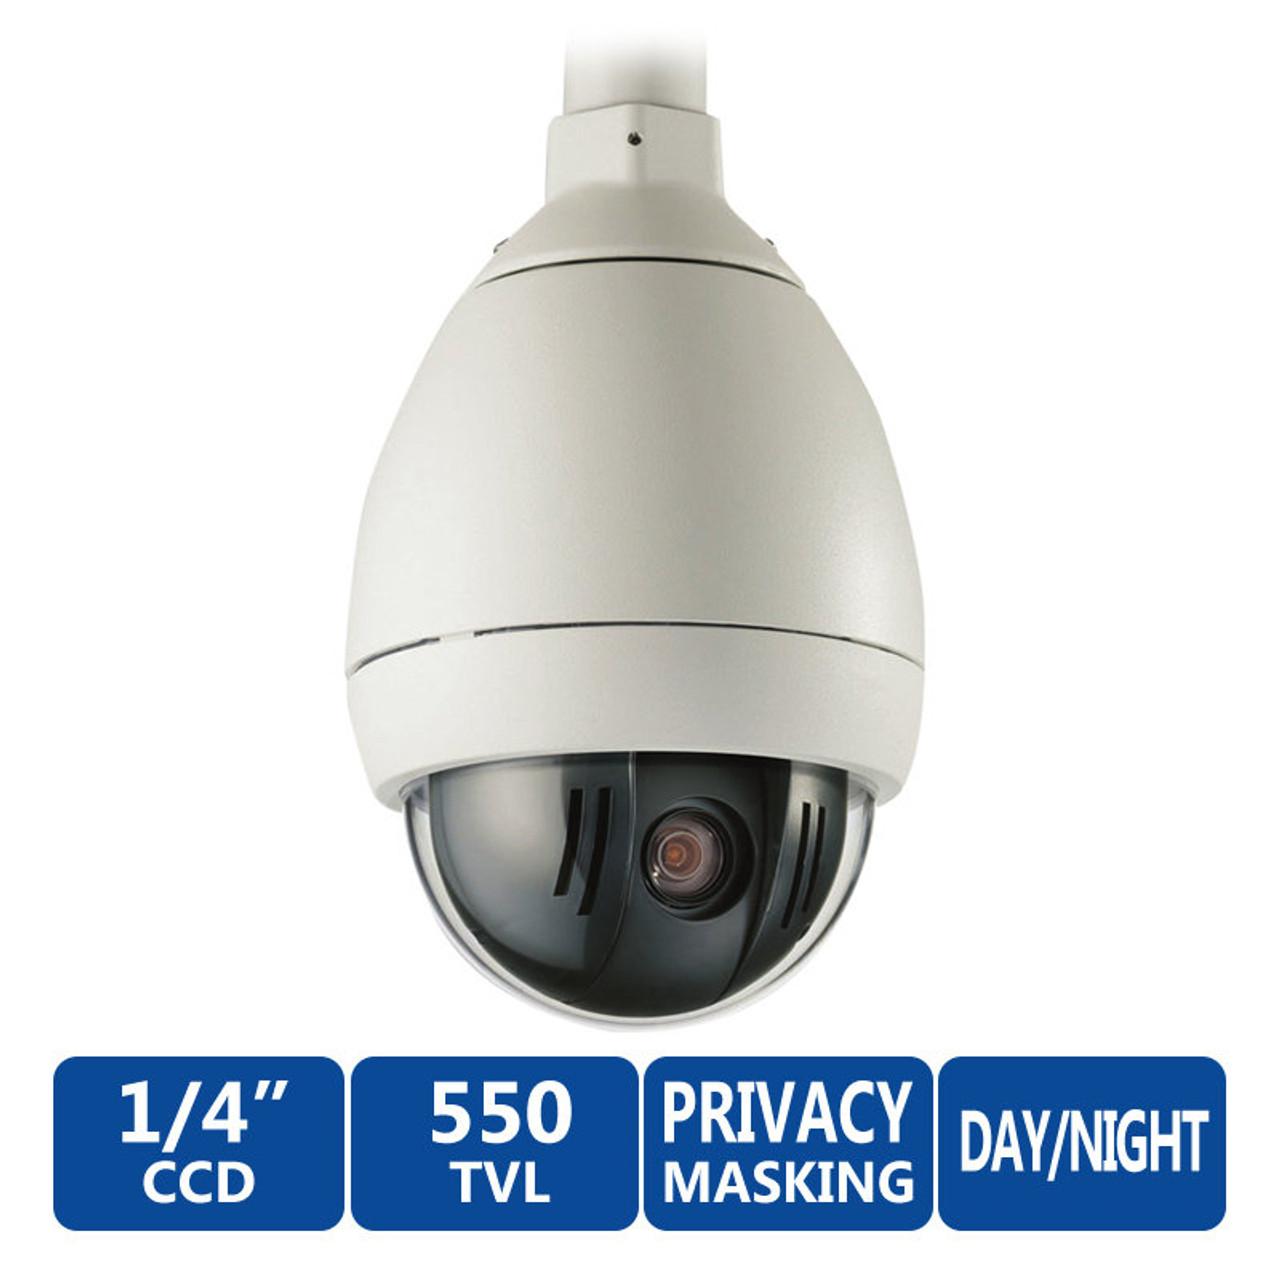 hight resolution of bosch vg5 624 ecs 550tvl outdoor ptz cctv analog security camera autodome ptz camera wiring diagram